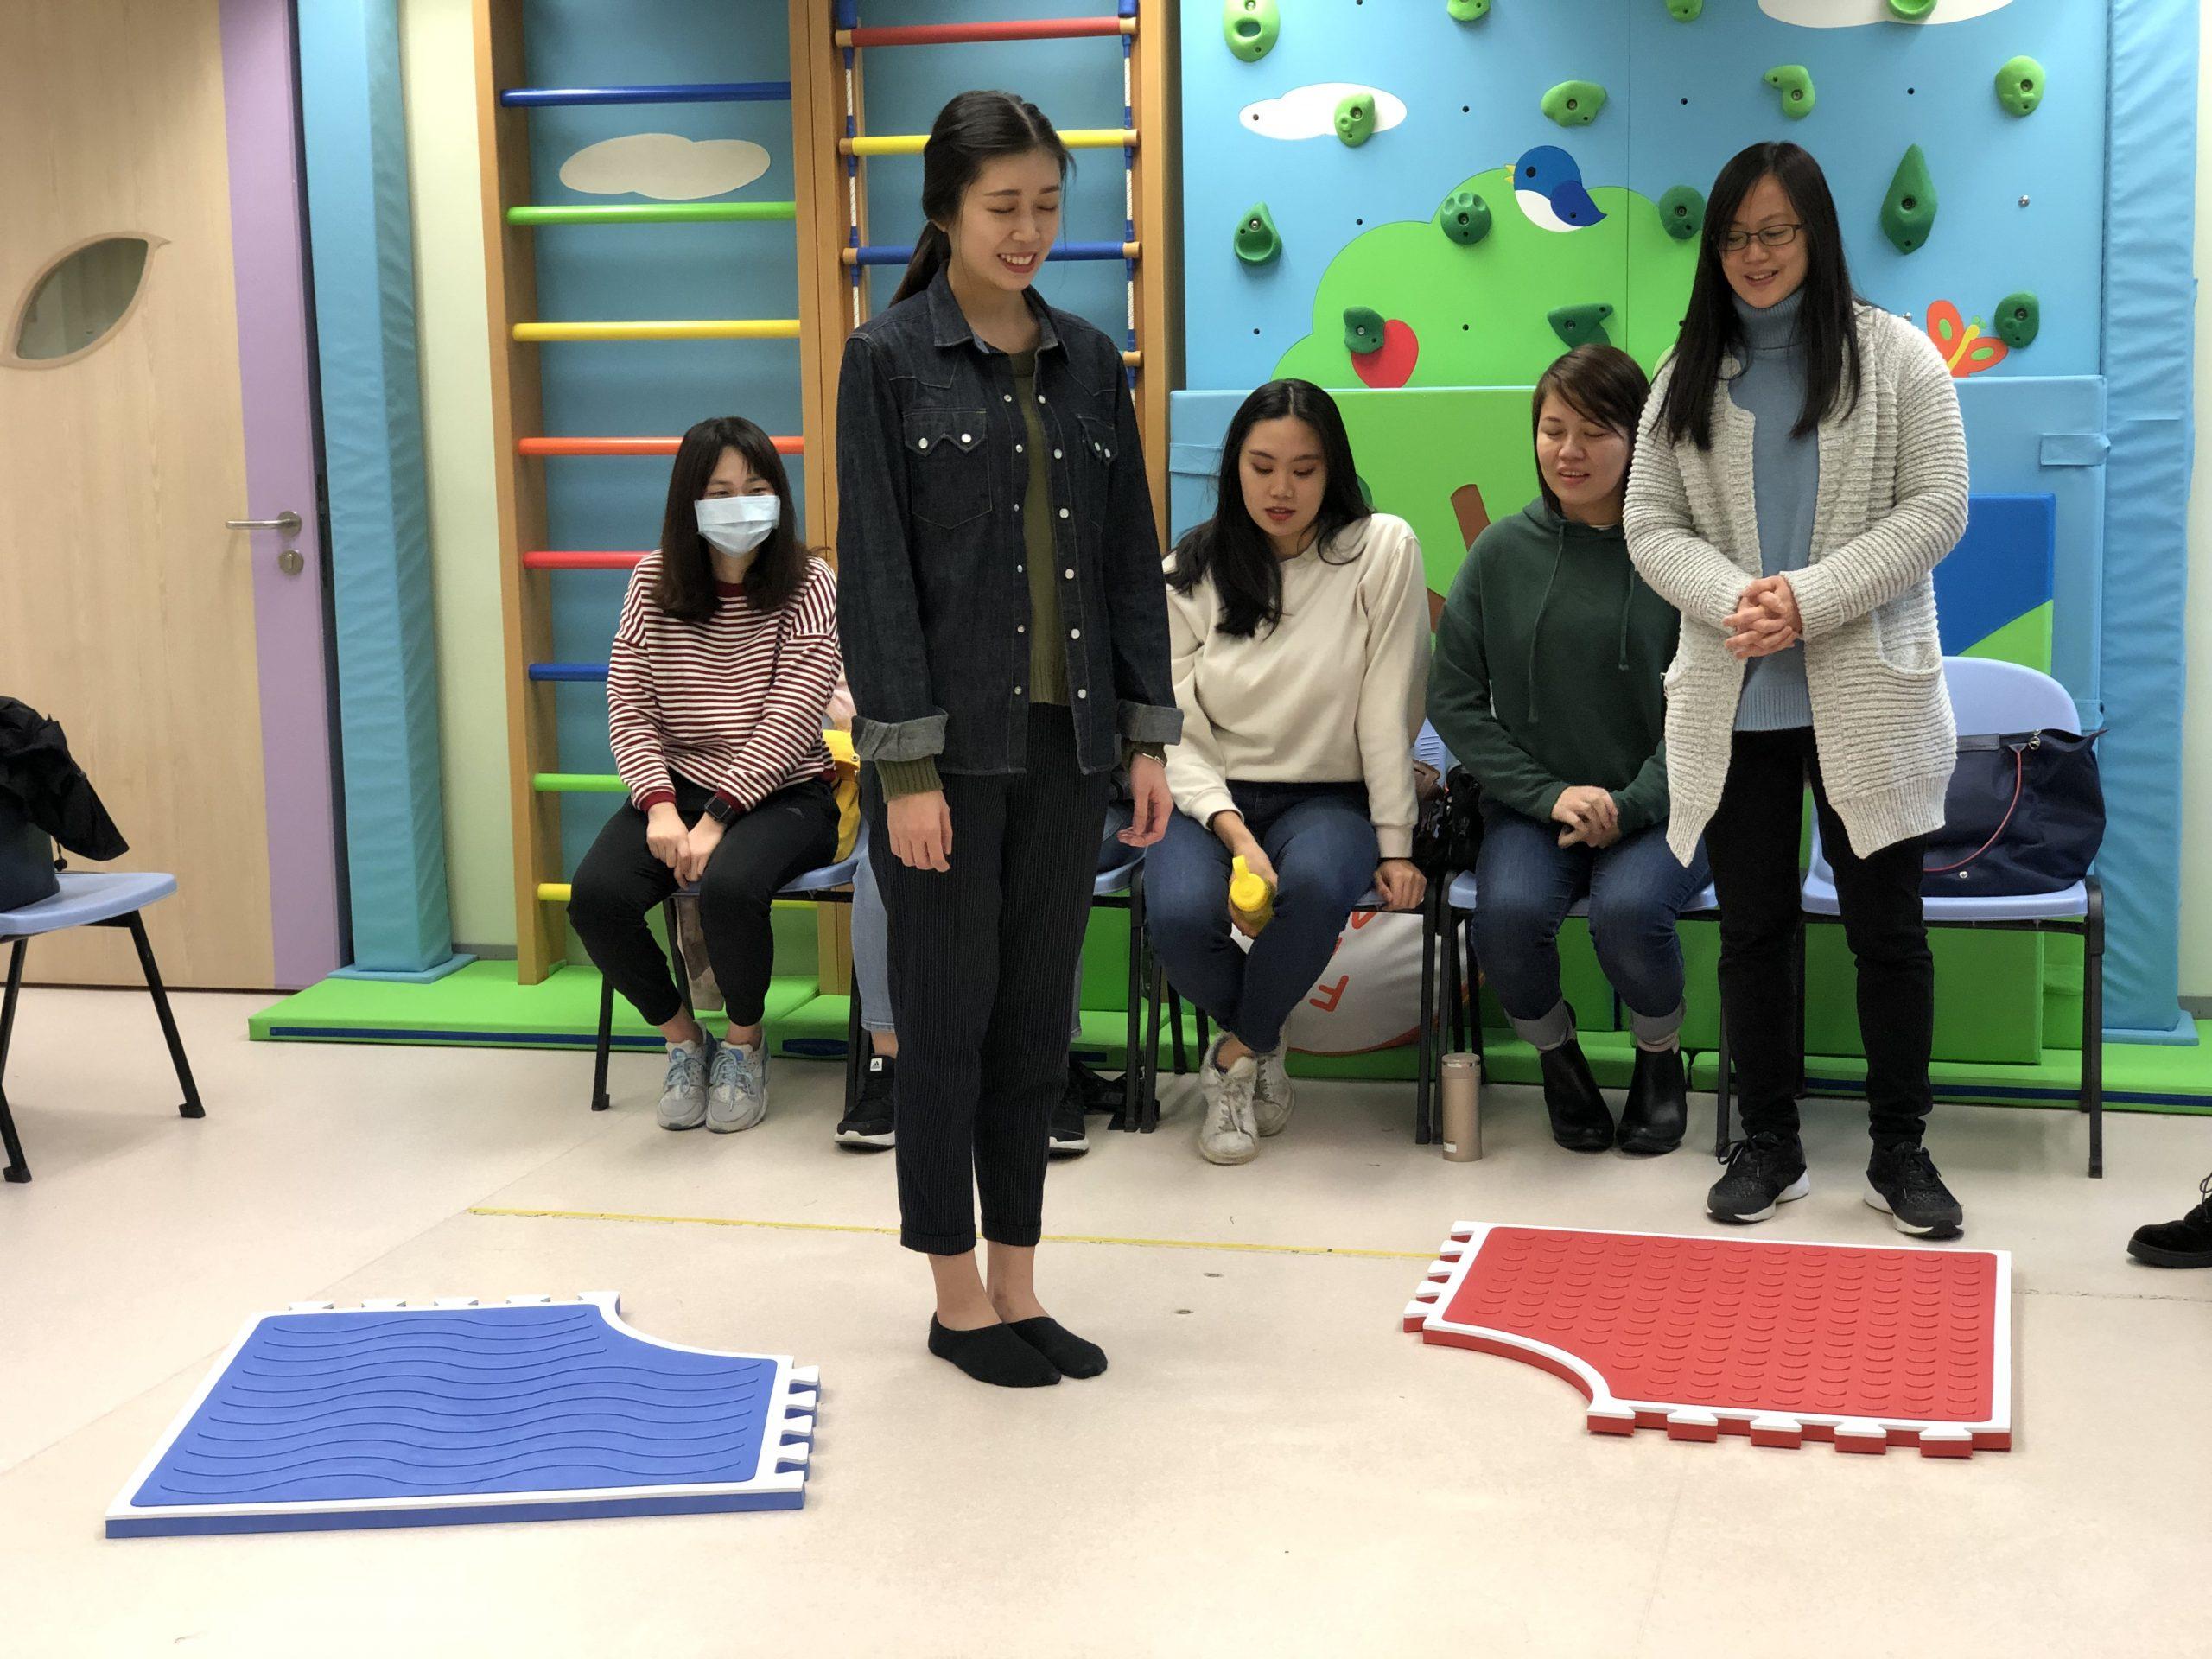 Teachers were receiving training to learn each game